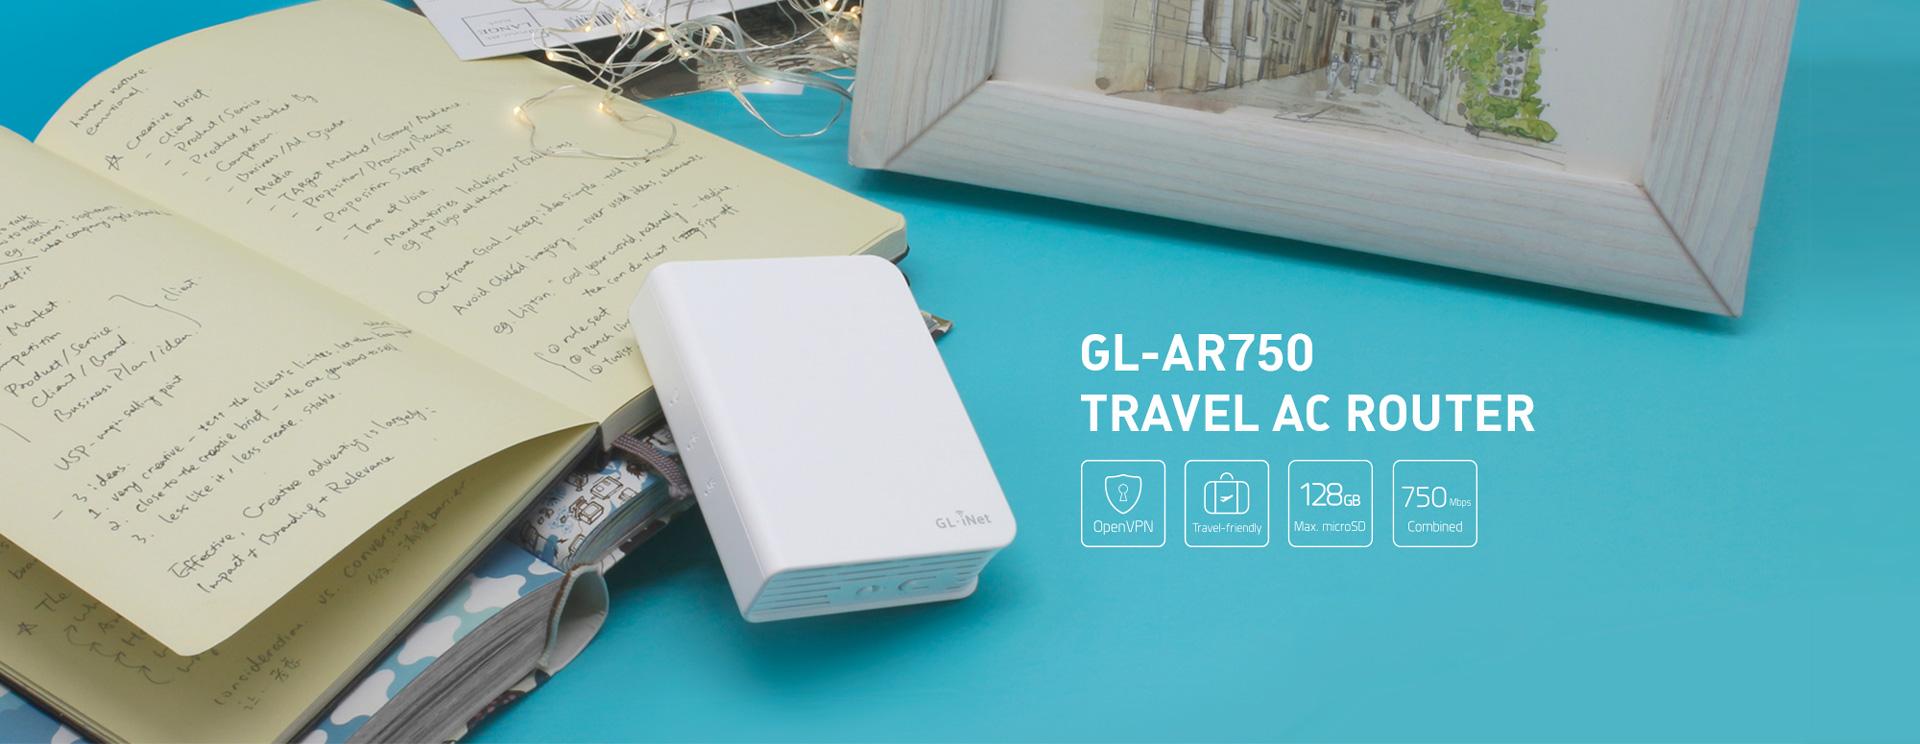 gl-inet products GL-AR750